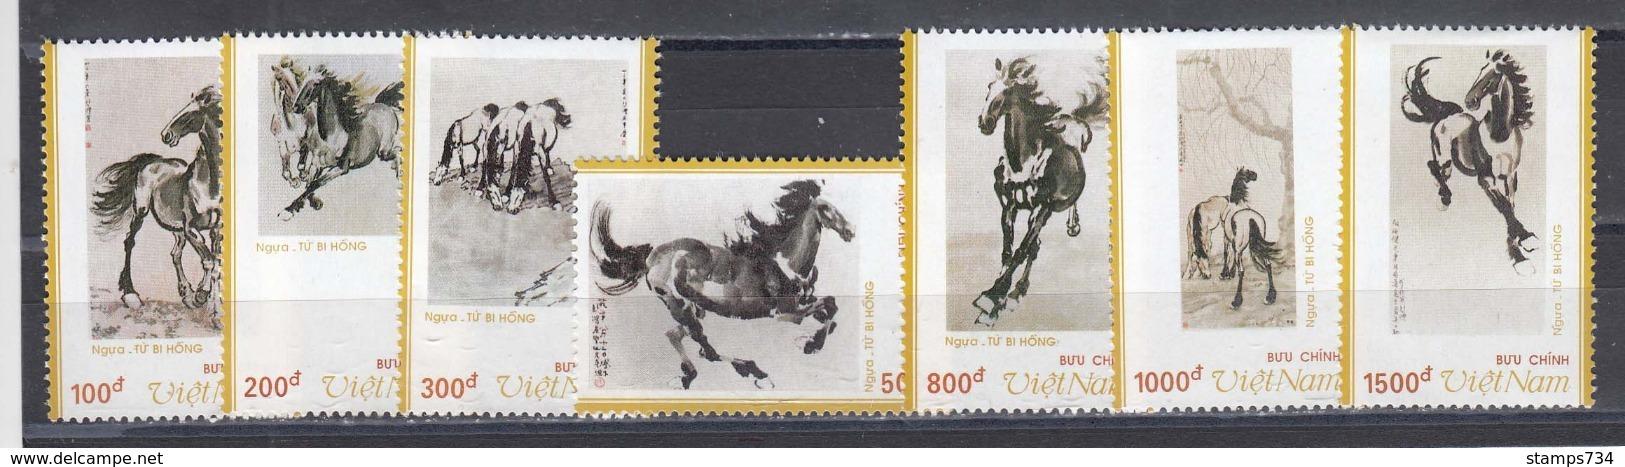 Vietnam 1989 - Tableaux: Chevaux, Mi-Nr. 2110/16, Dent., MNH** - Vietnam